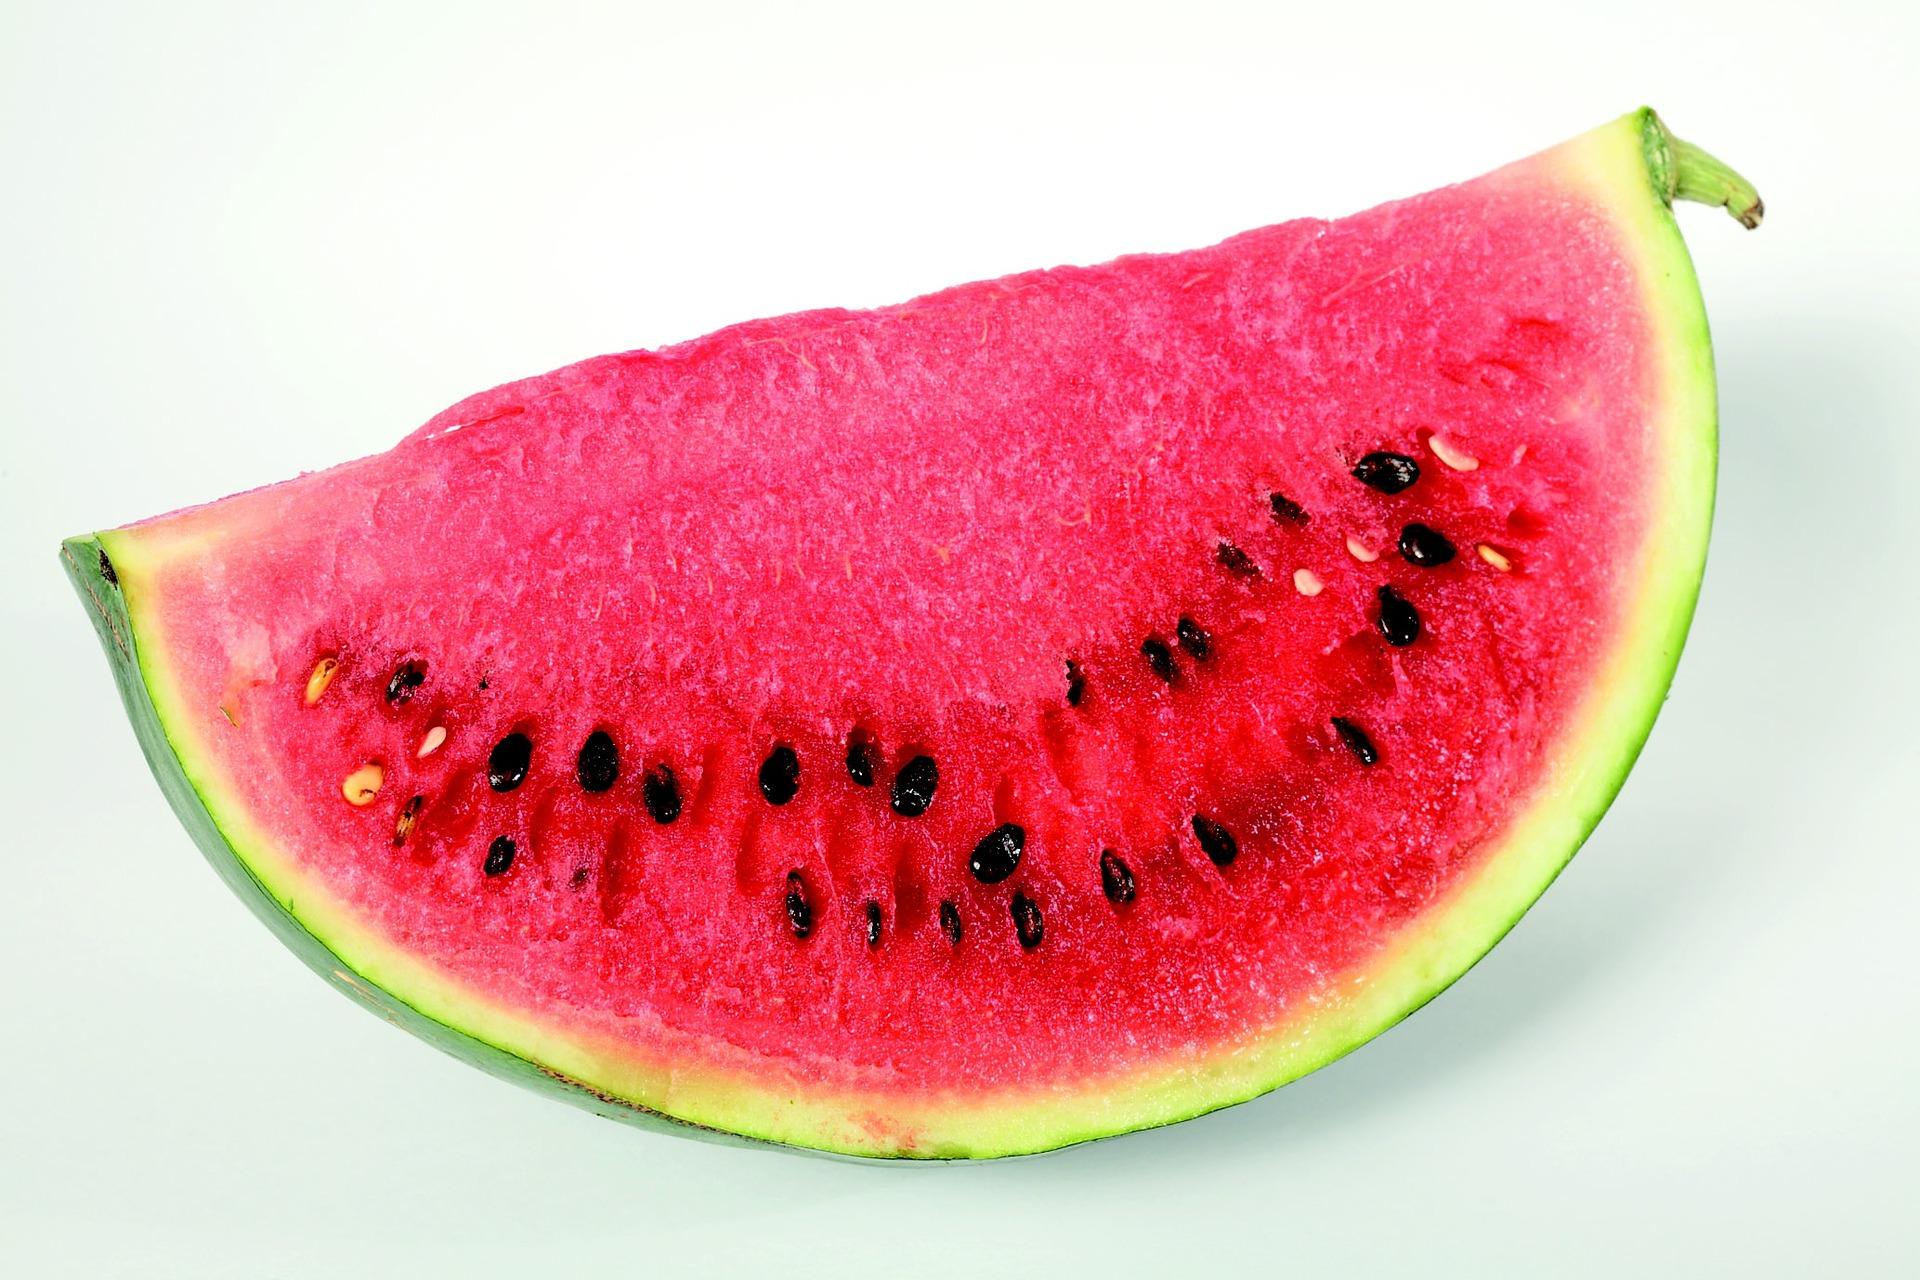 watermelon-1504404_1920